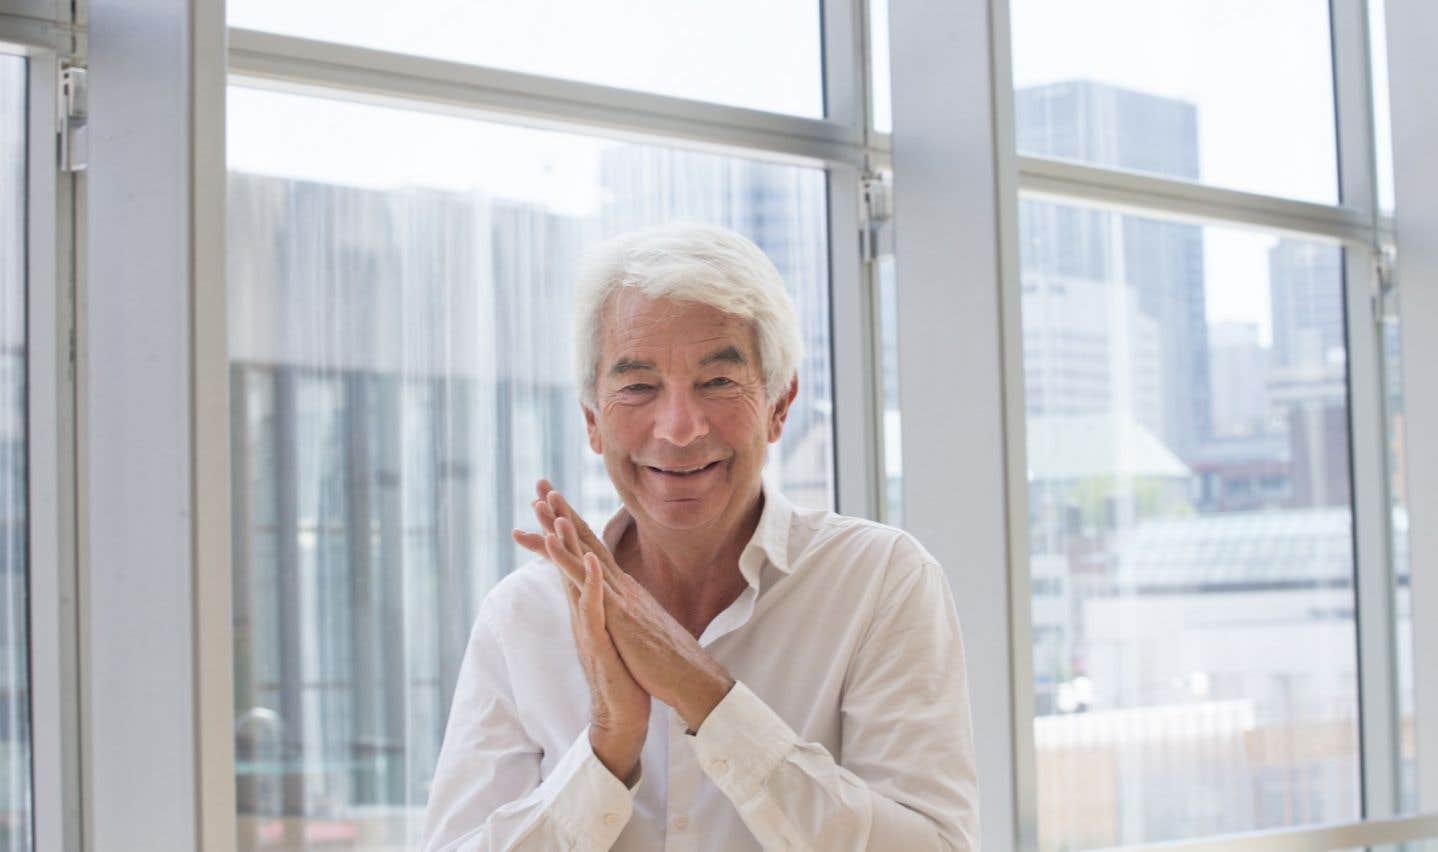 À 69ans, Jean-Philippe Collard n'a pas perdu sa superbe, son aplomb, sa puissance, son élégance.